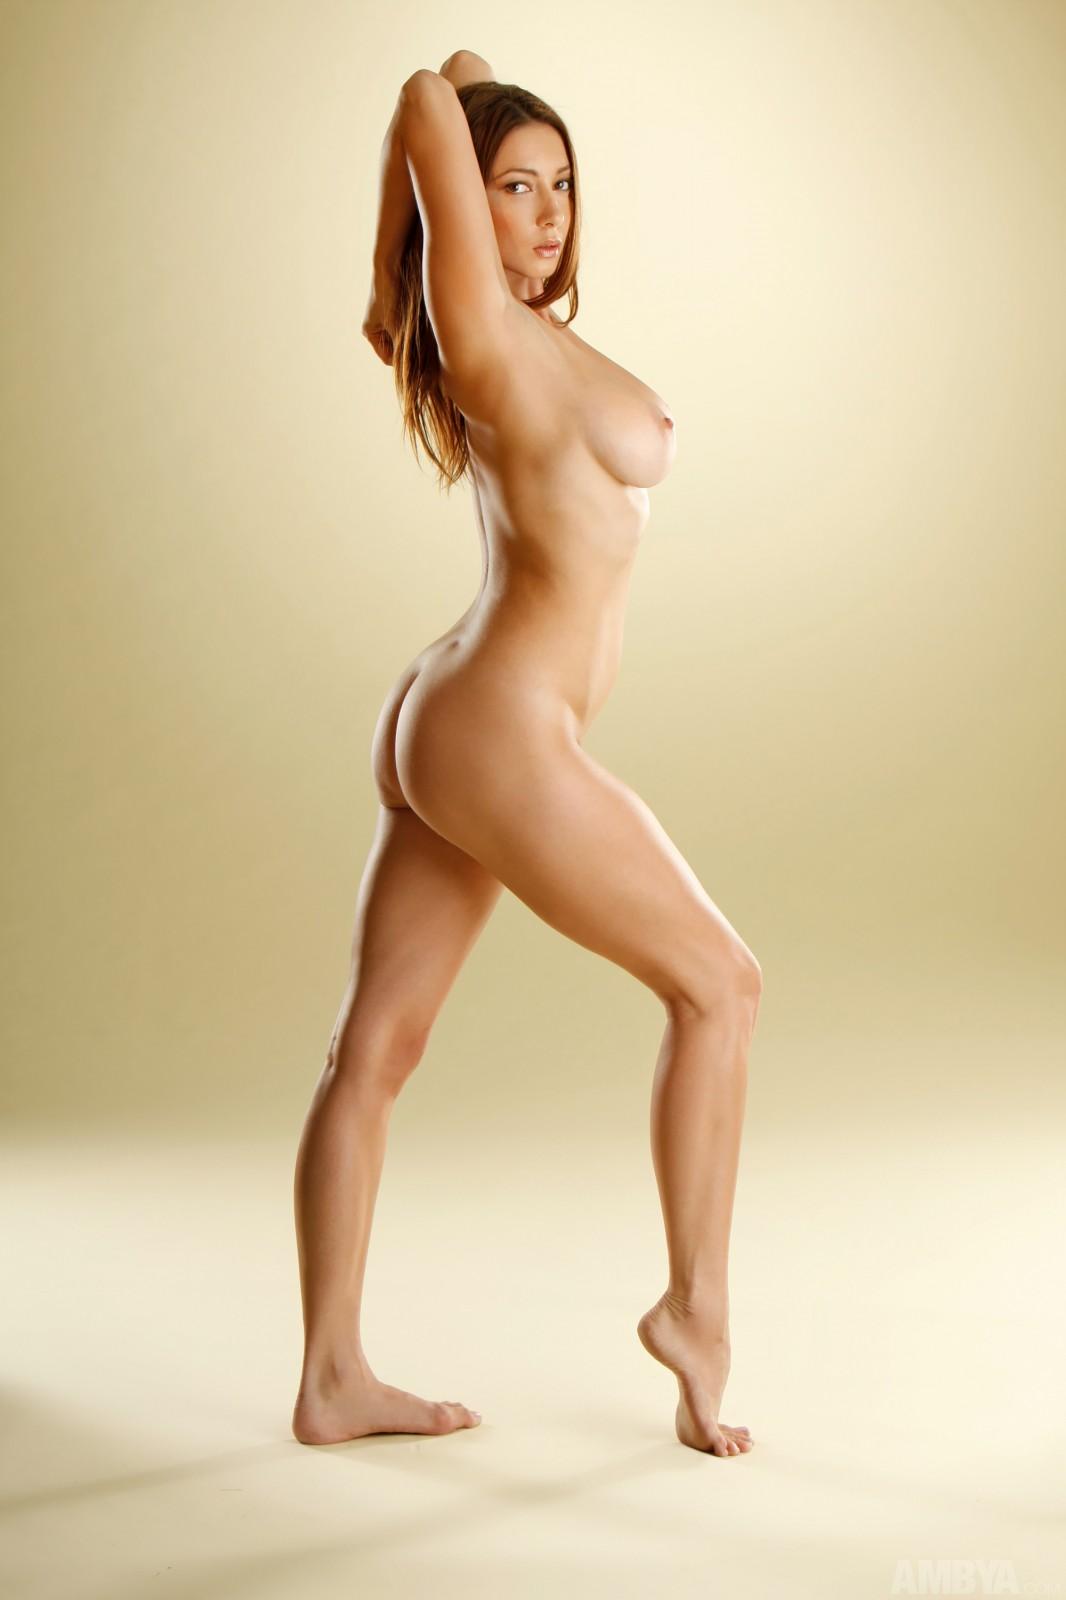 Beautiful nude female lovemaking